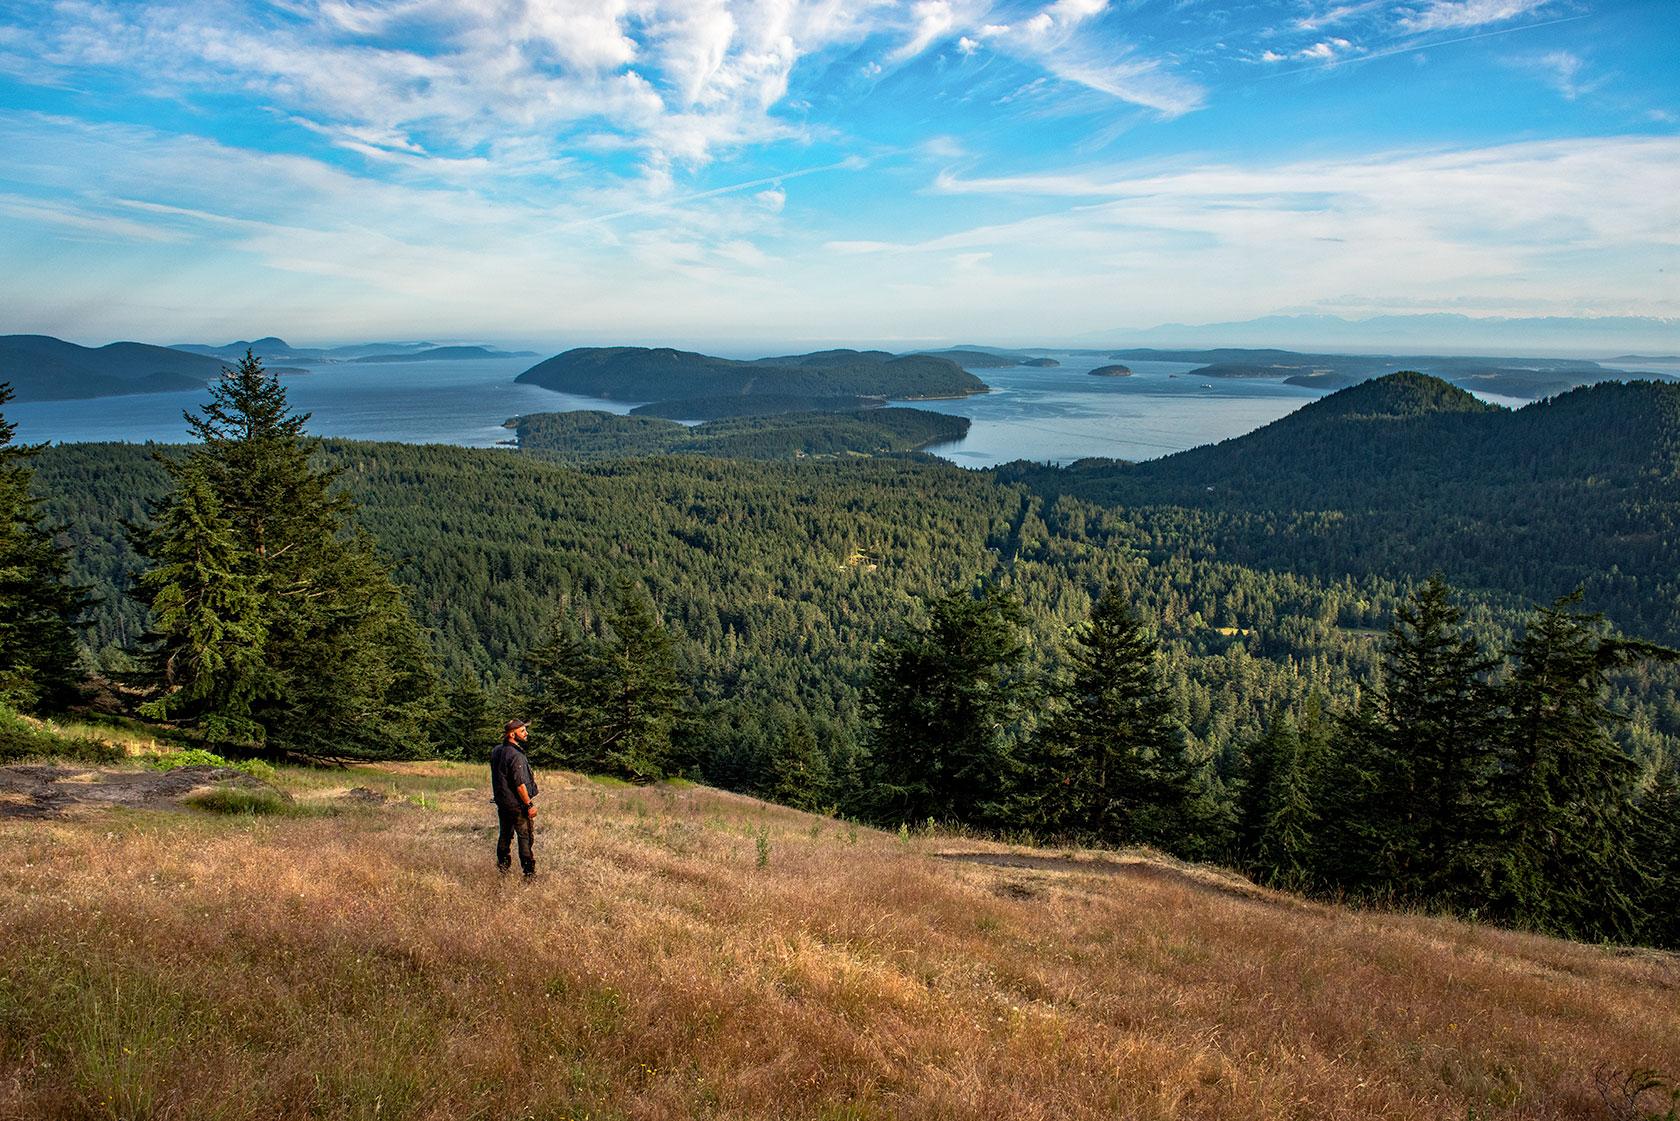 austin-trigg-brave-wilderness-orcas-island-coyote-peterson-meadow-overlook.jpg